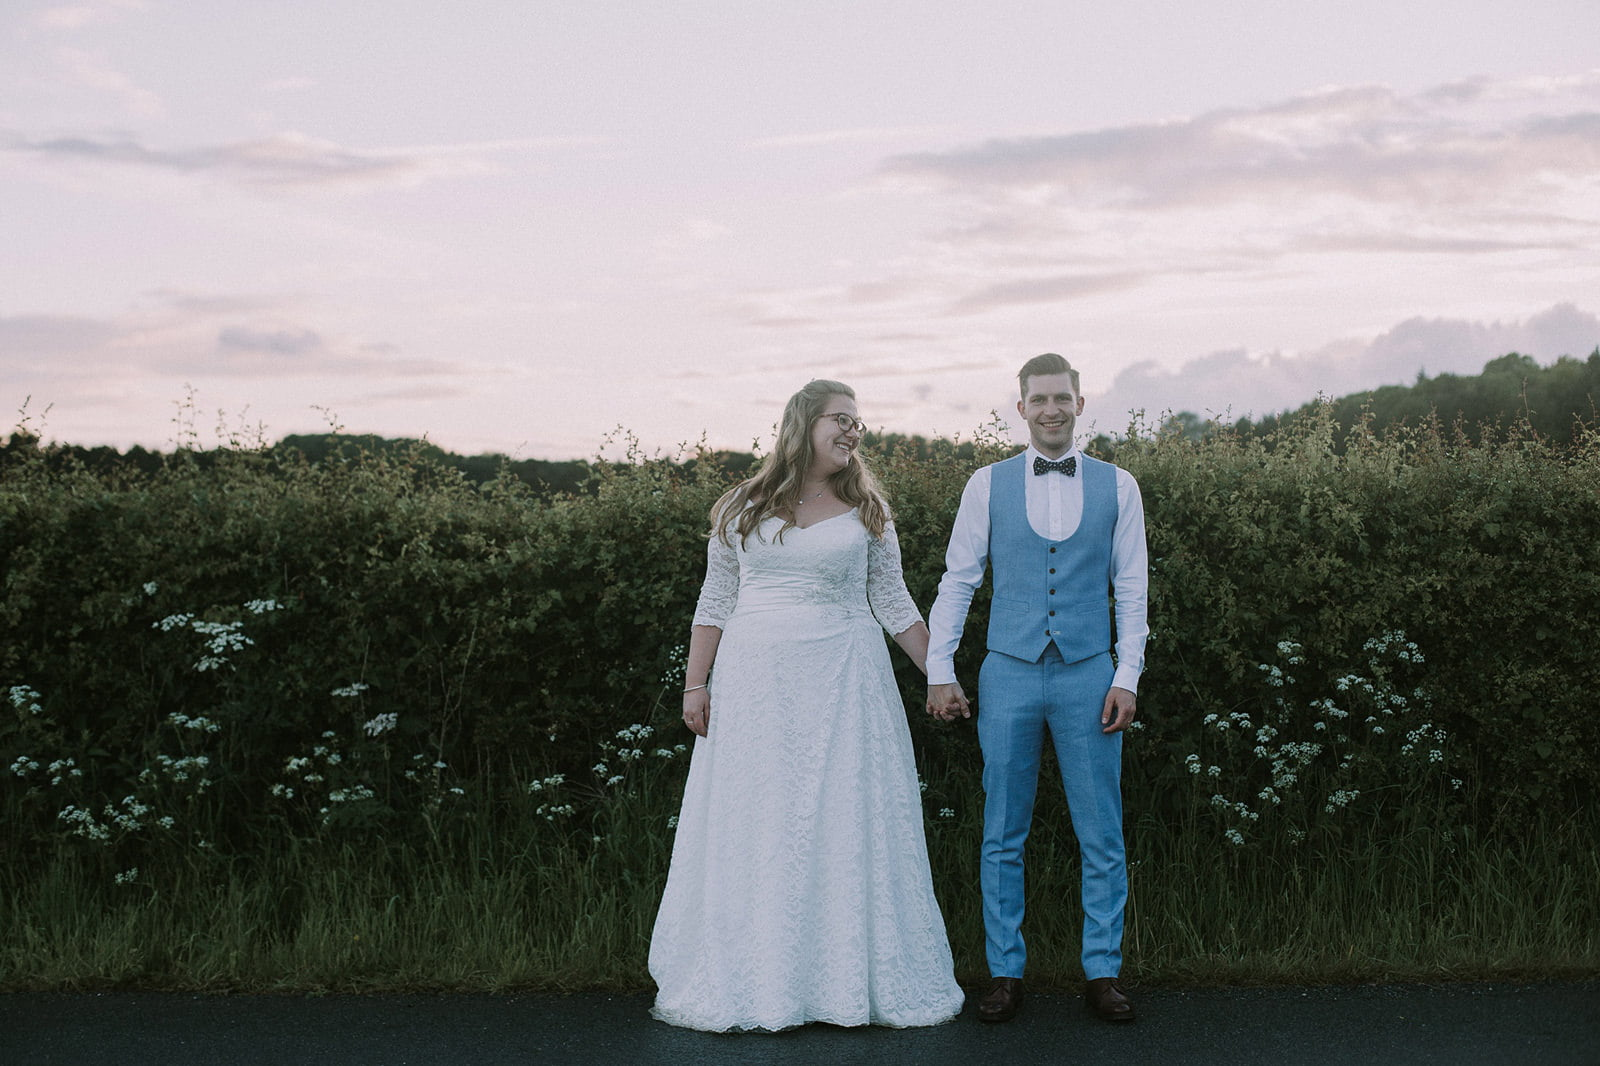 beautiful wedding photos london